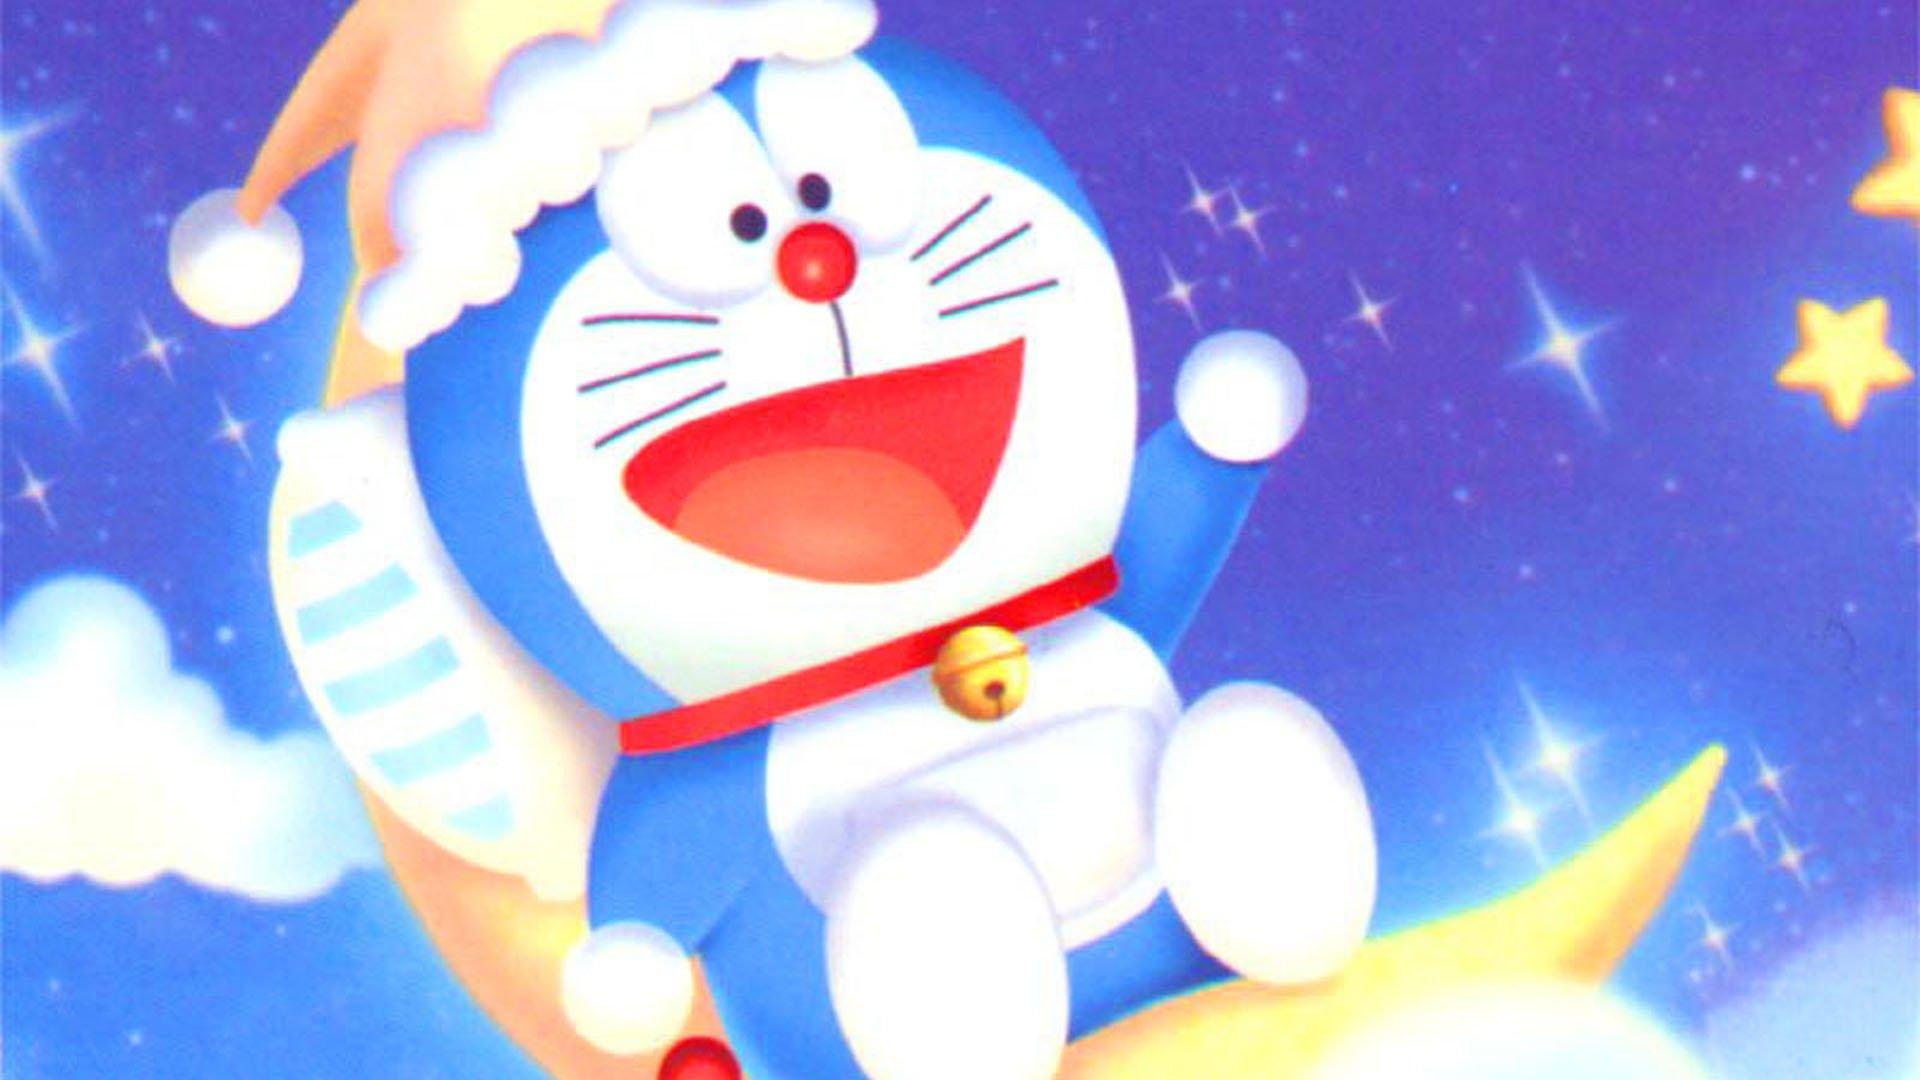 Doraemon 1920x1080 Wallpapers 1920x1080 Wallpapers Pictures 1920x1080